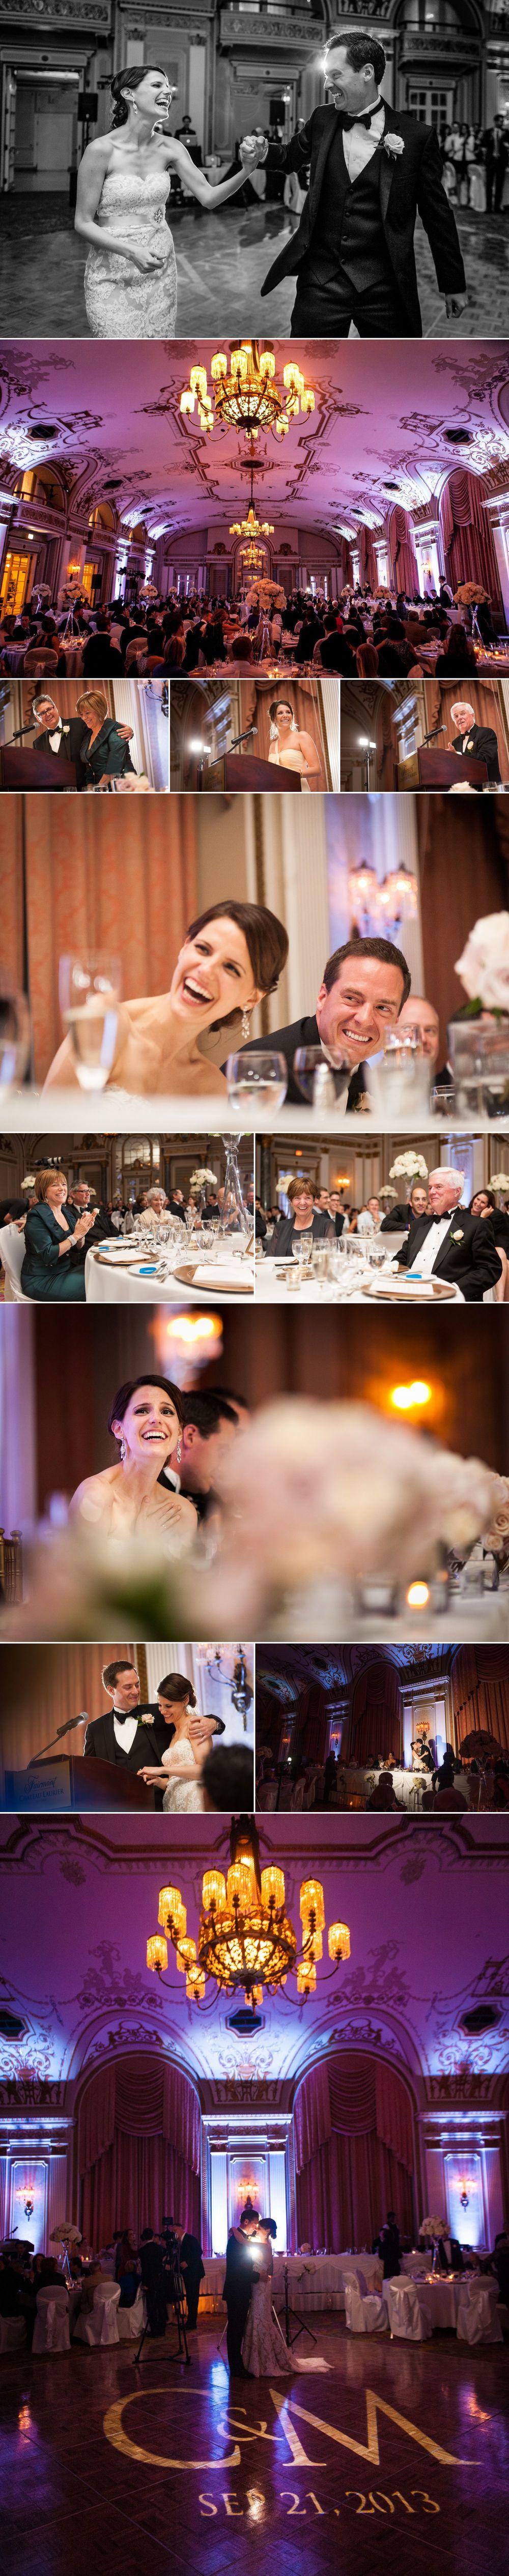 Wedding reception photos at le chateau laurier